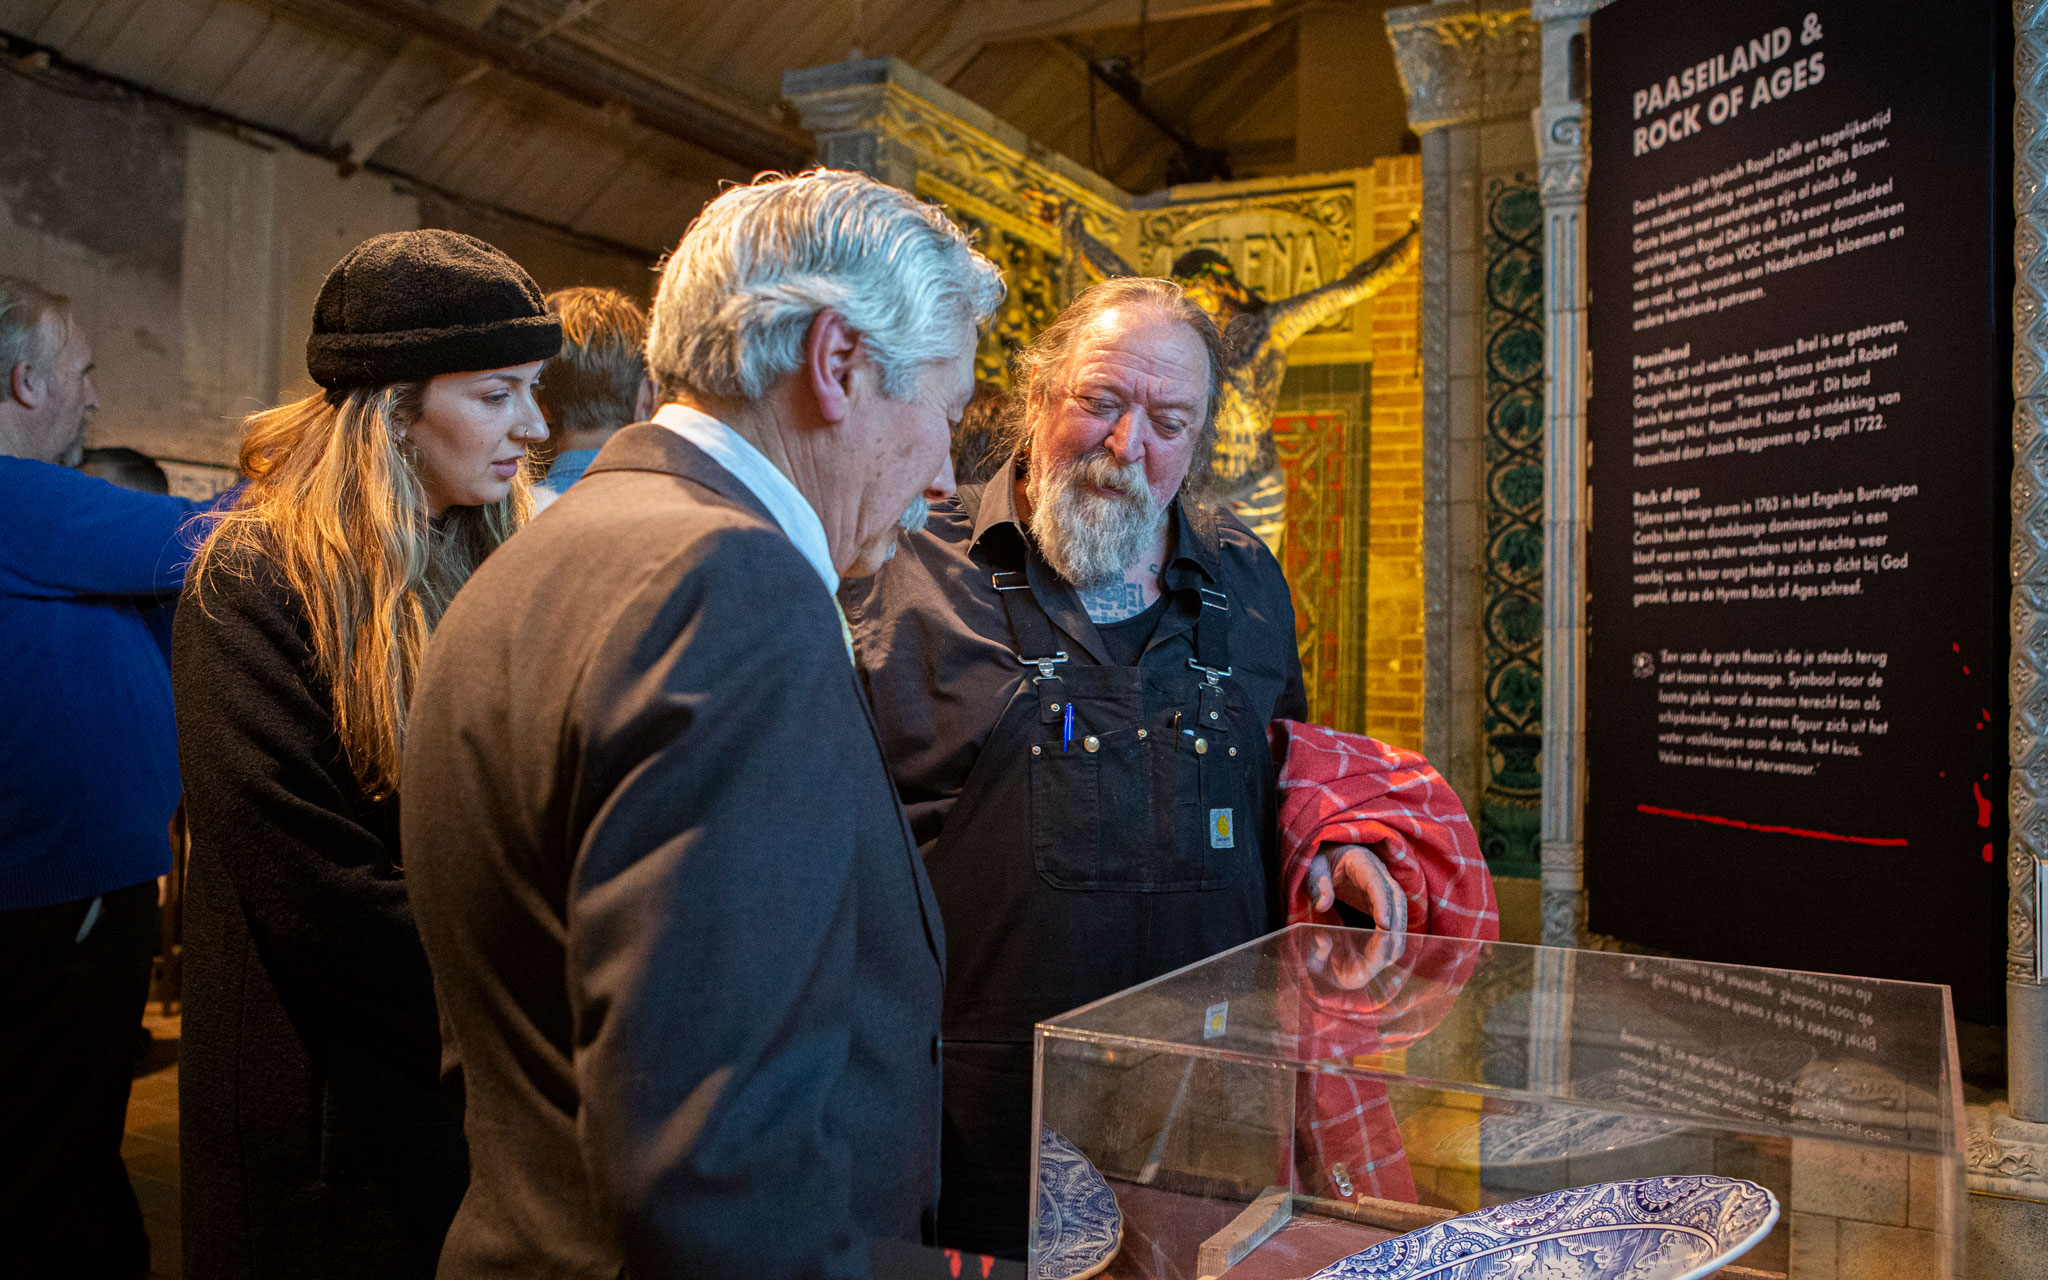 Foto Henk Schiffmacher, Morrison Schiffmacher in Royal Delft expo